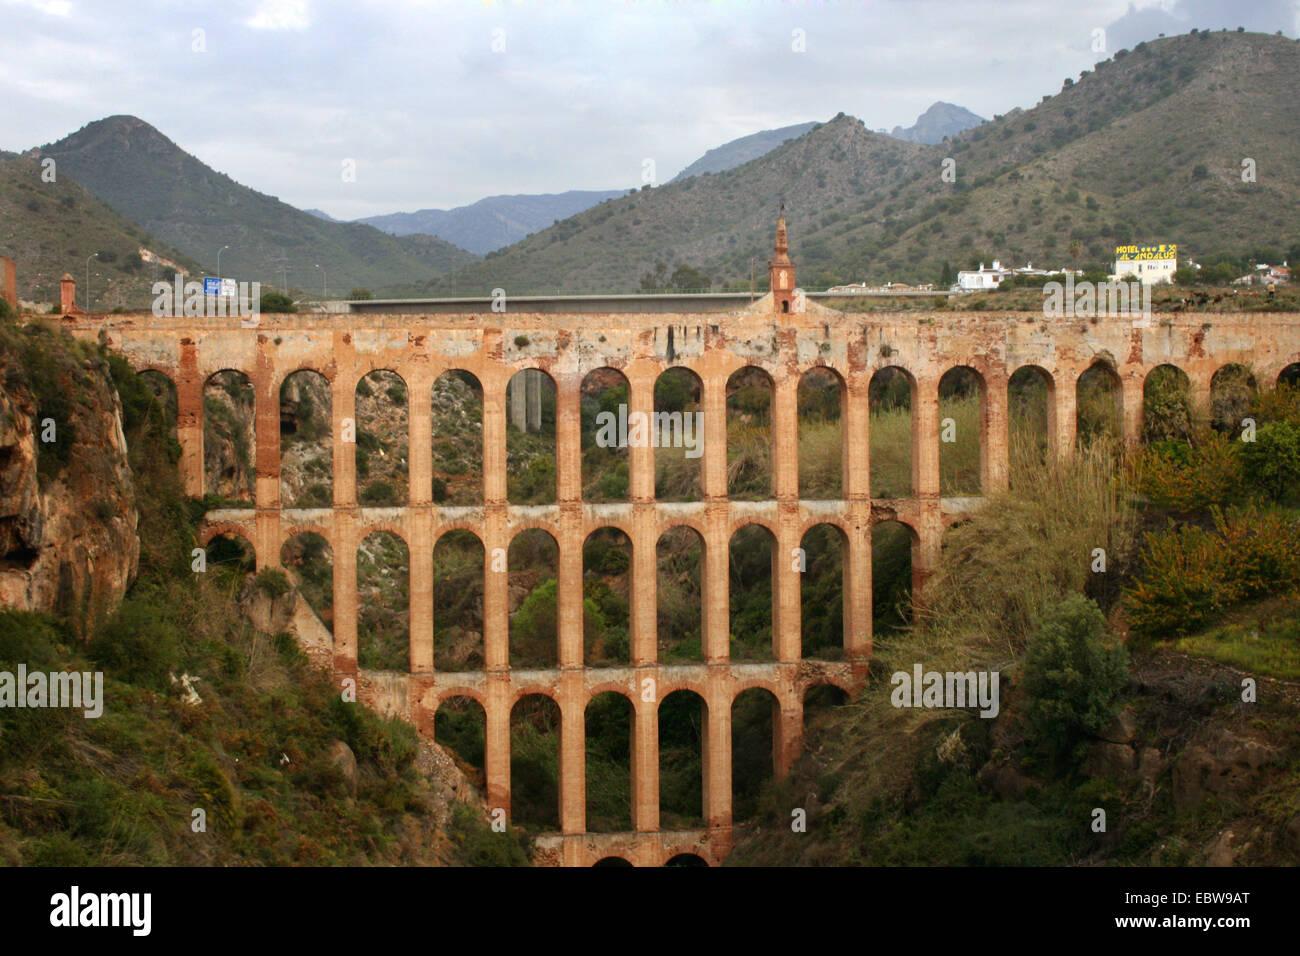 aqueduct, Acueducto El Aguila, Spain, Andalusia, Nerja - Stock Image